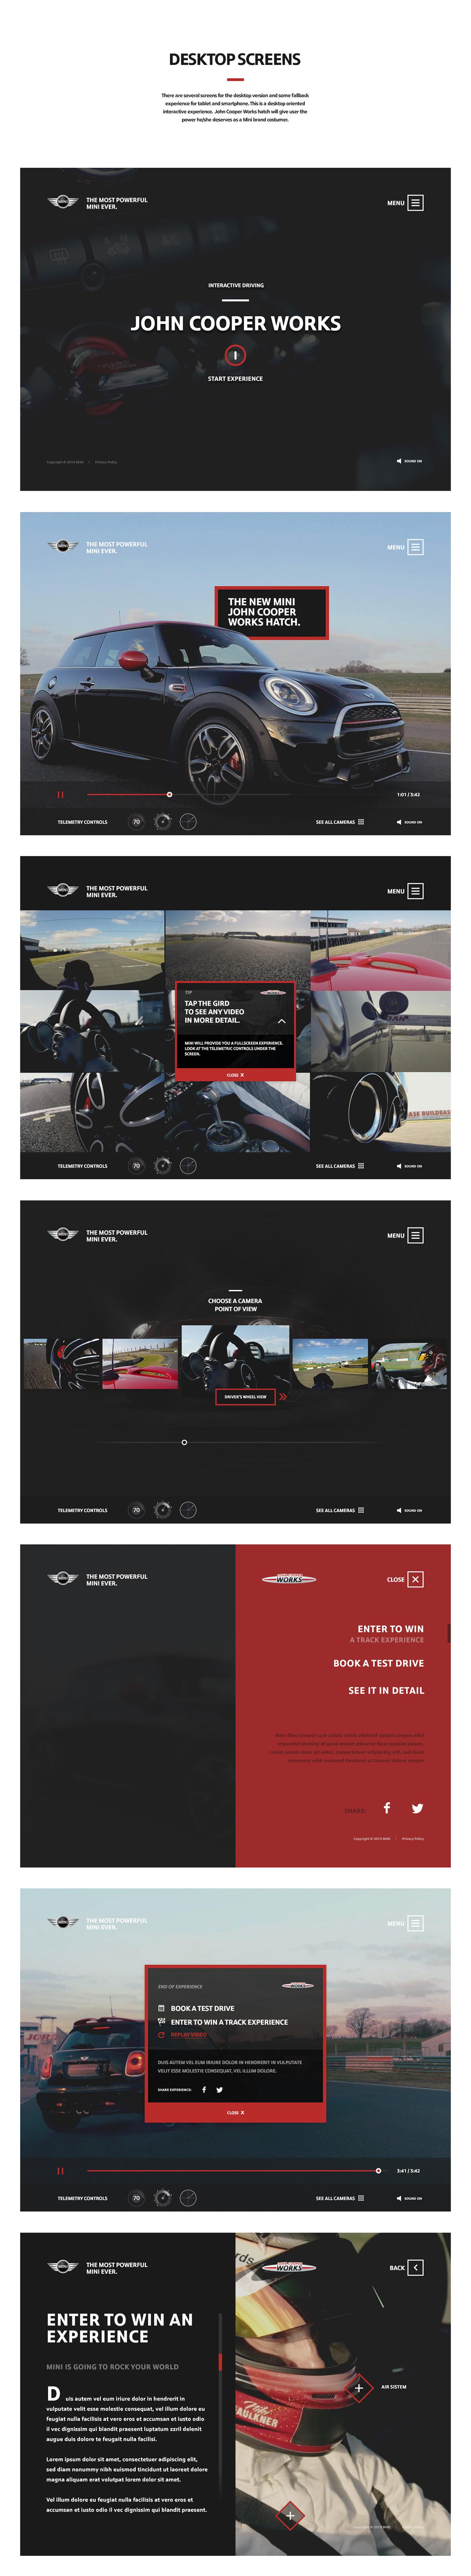 Mini Cooper Worksinteractive Experience From Media Monks Web Design Website Design Inspiration Mini Cooper Works